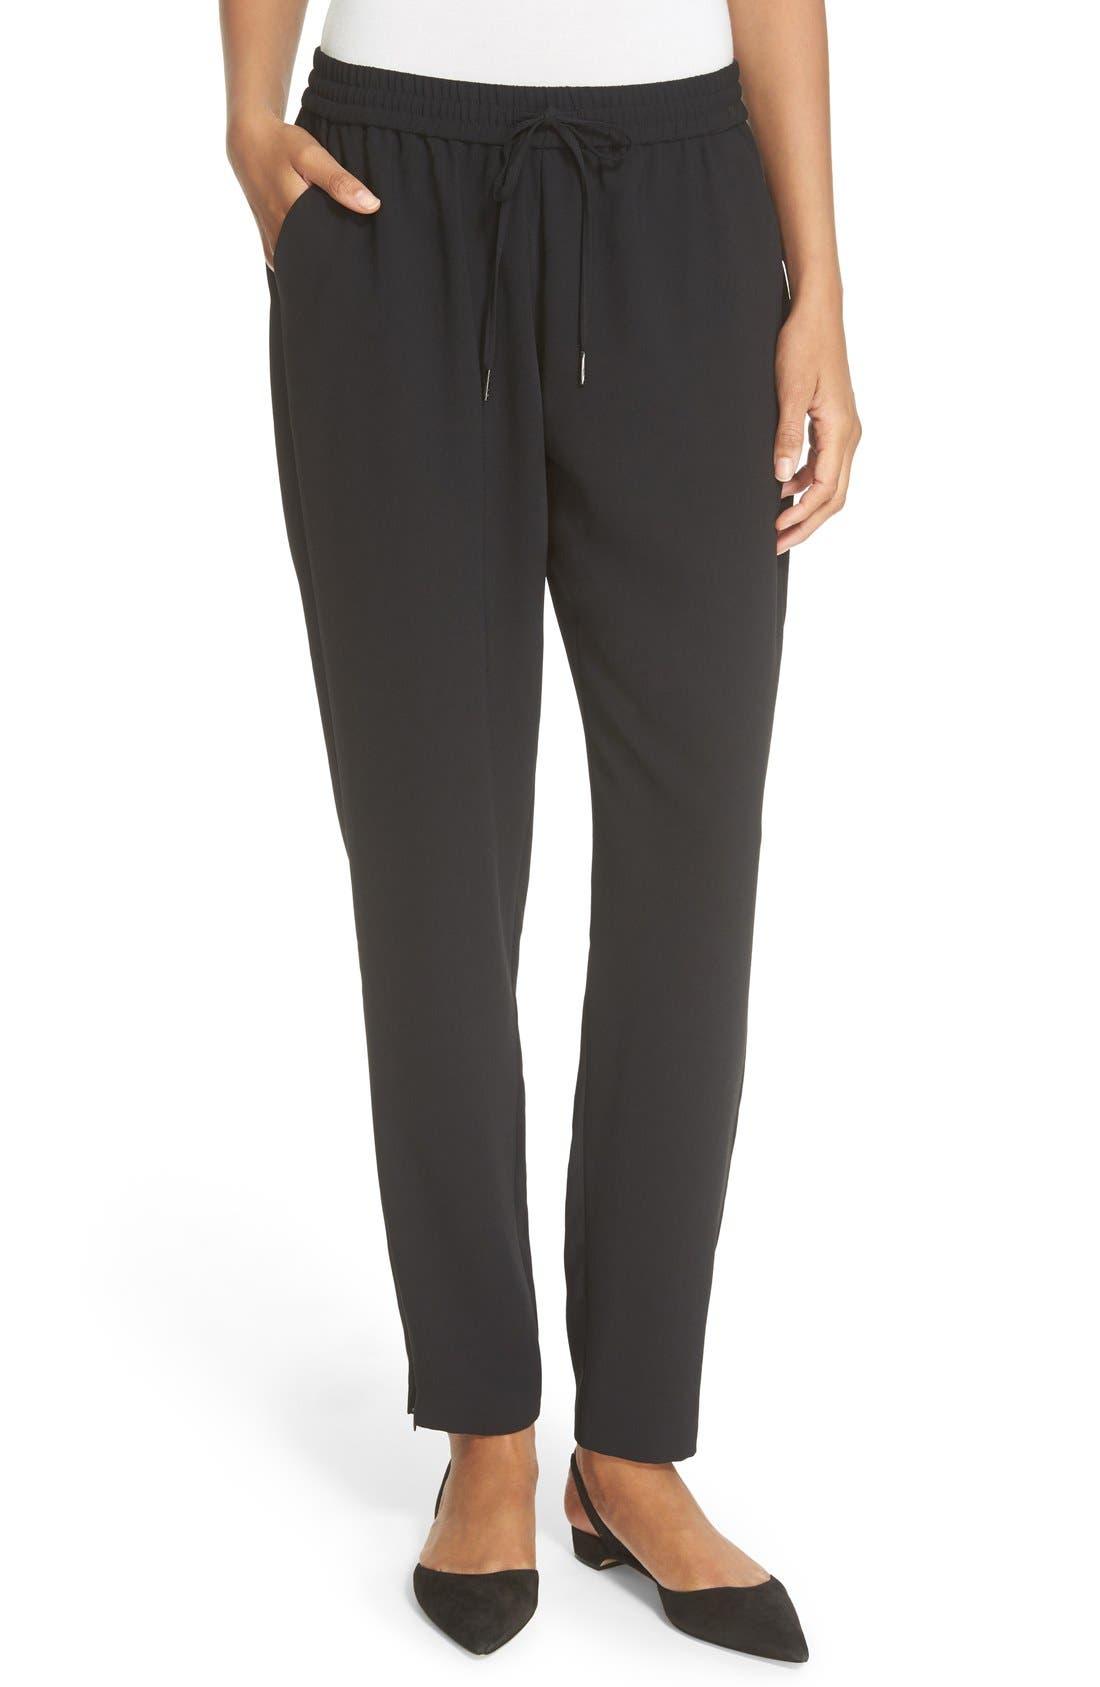 Main Image - Joie 'Janeene' Zip Ankle Drawstring Pants